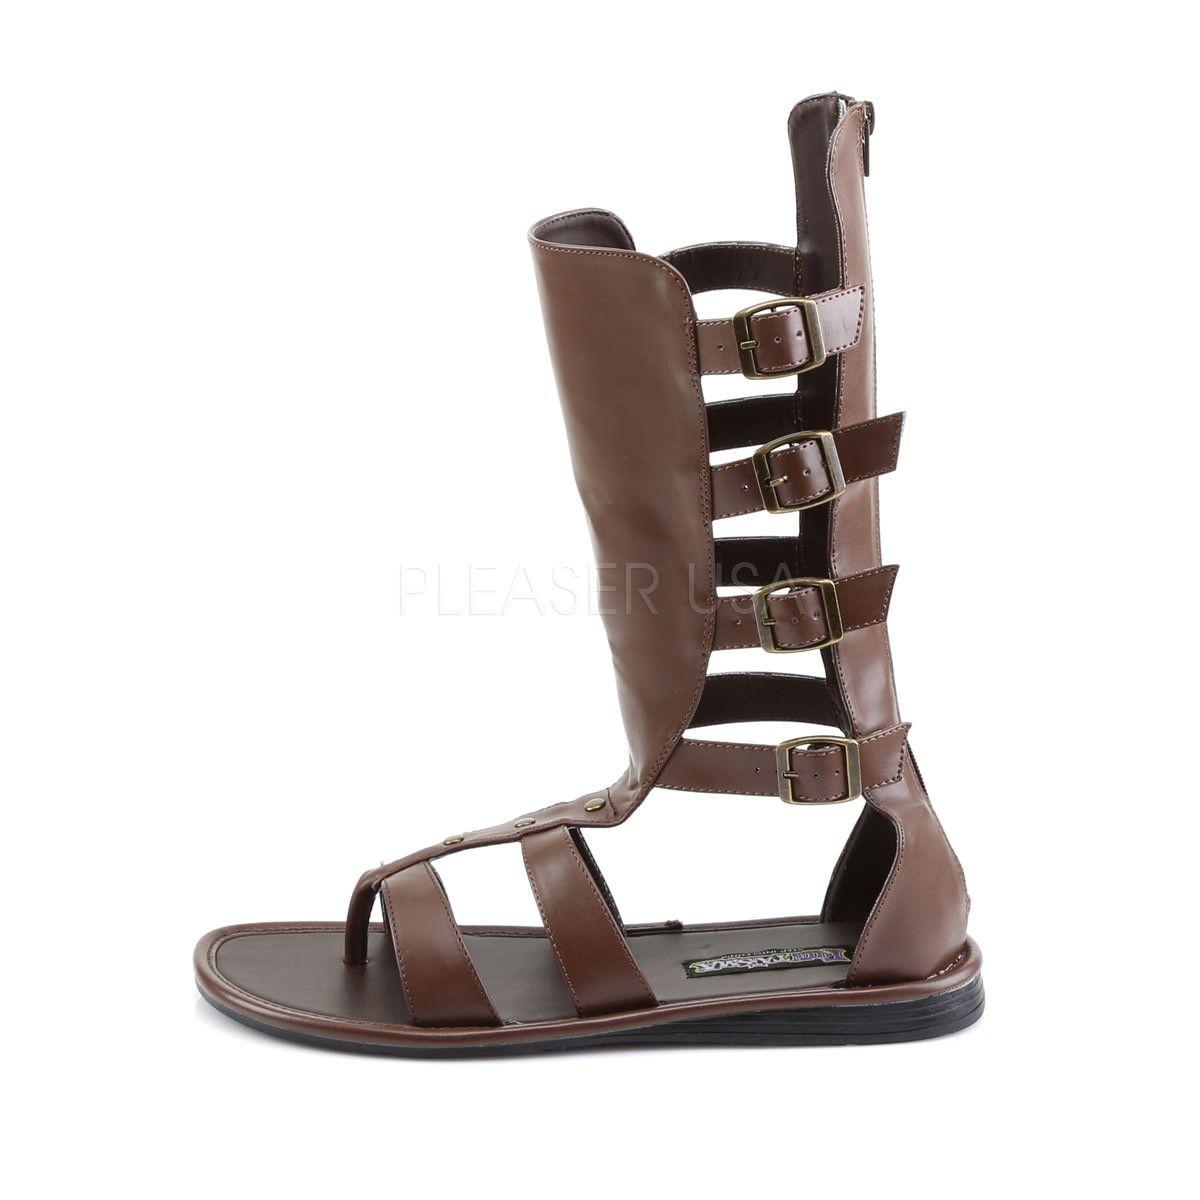 Men S Brown Pu Roman Gladiator Spartan Sandals High Gladiator Sandals Mens Sandals Sandals